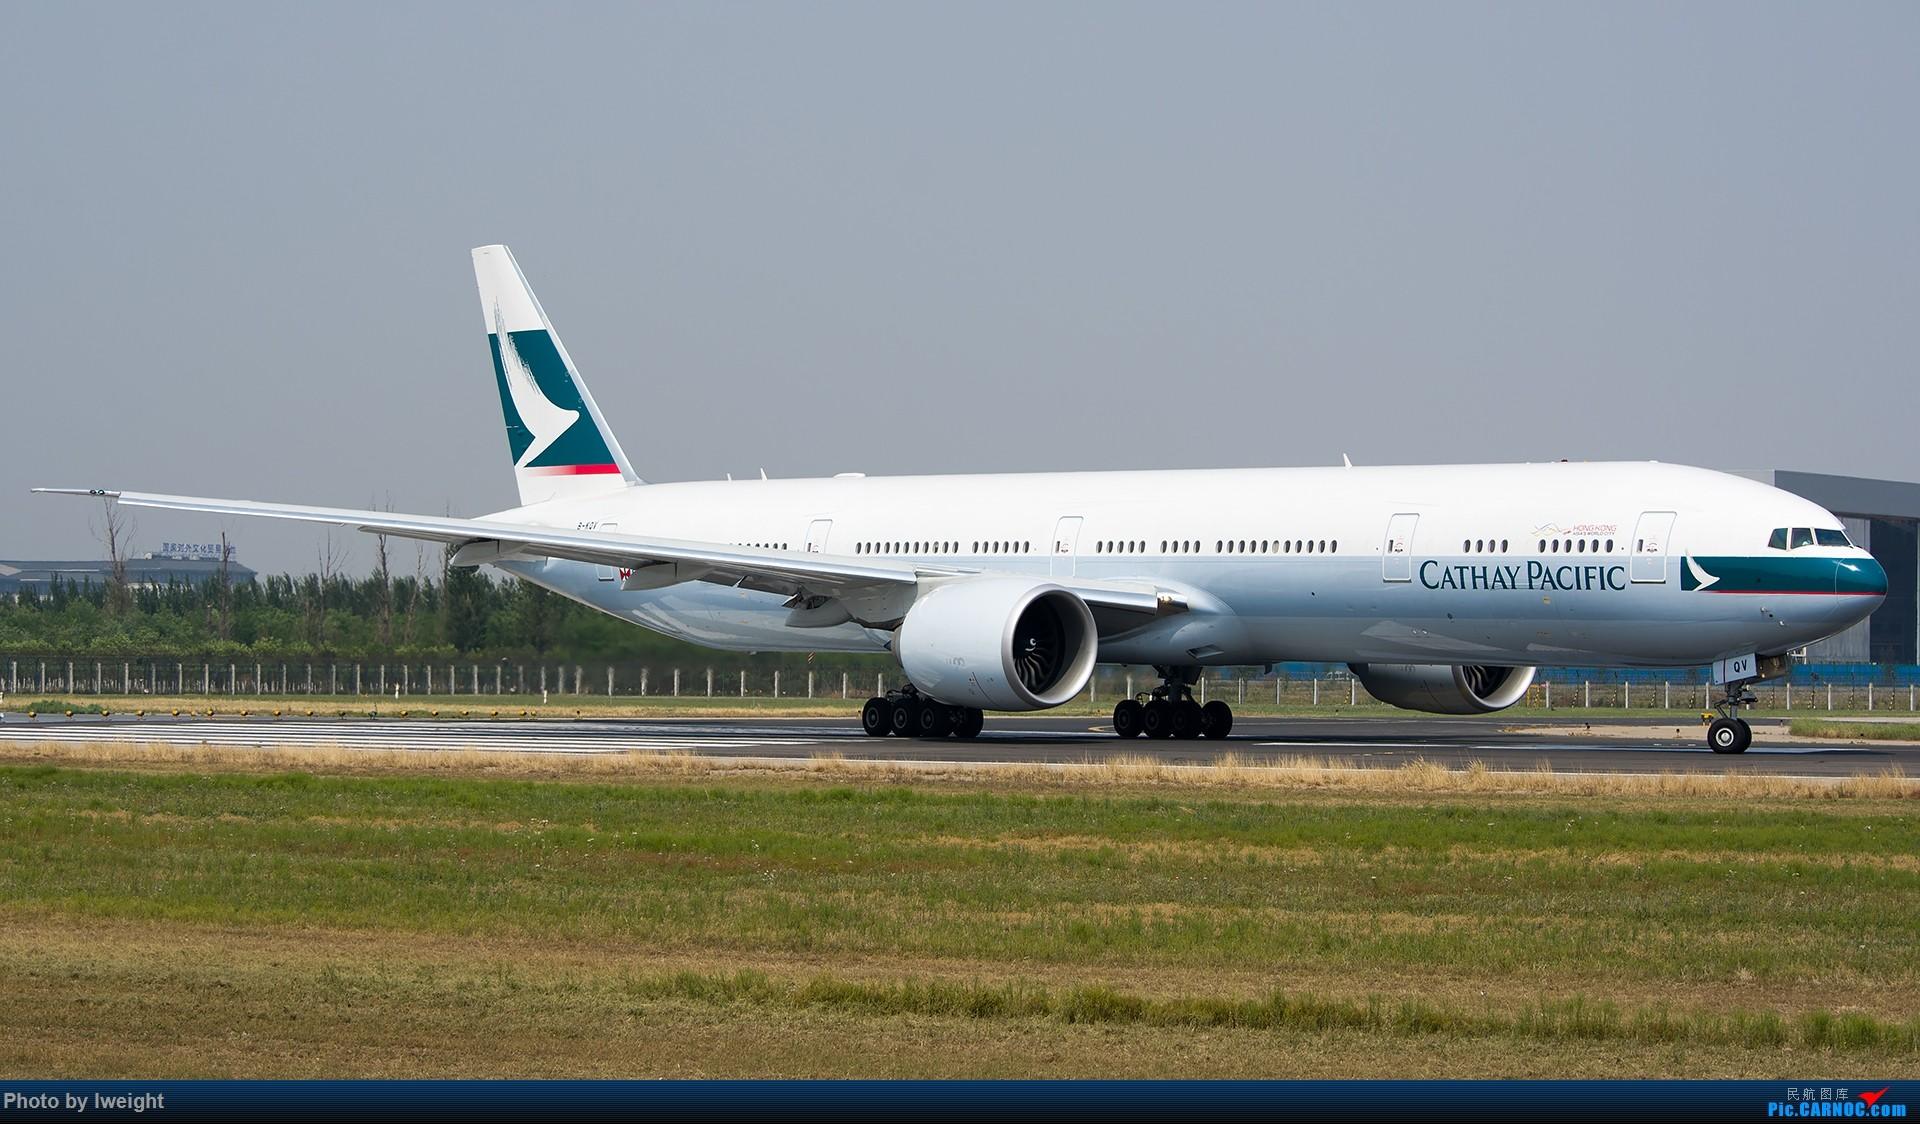 Re:[原创]周末帝都霾天拍机,凑合看看吧【2015-5-23】 BOEING 777-300ER B-KQV 中国北京首都国际机场